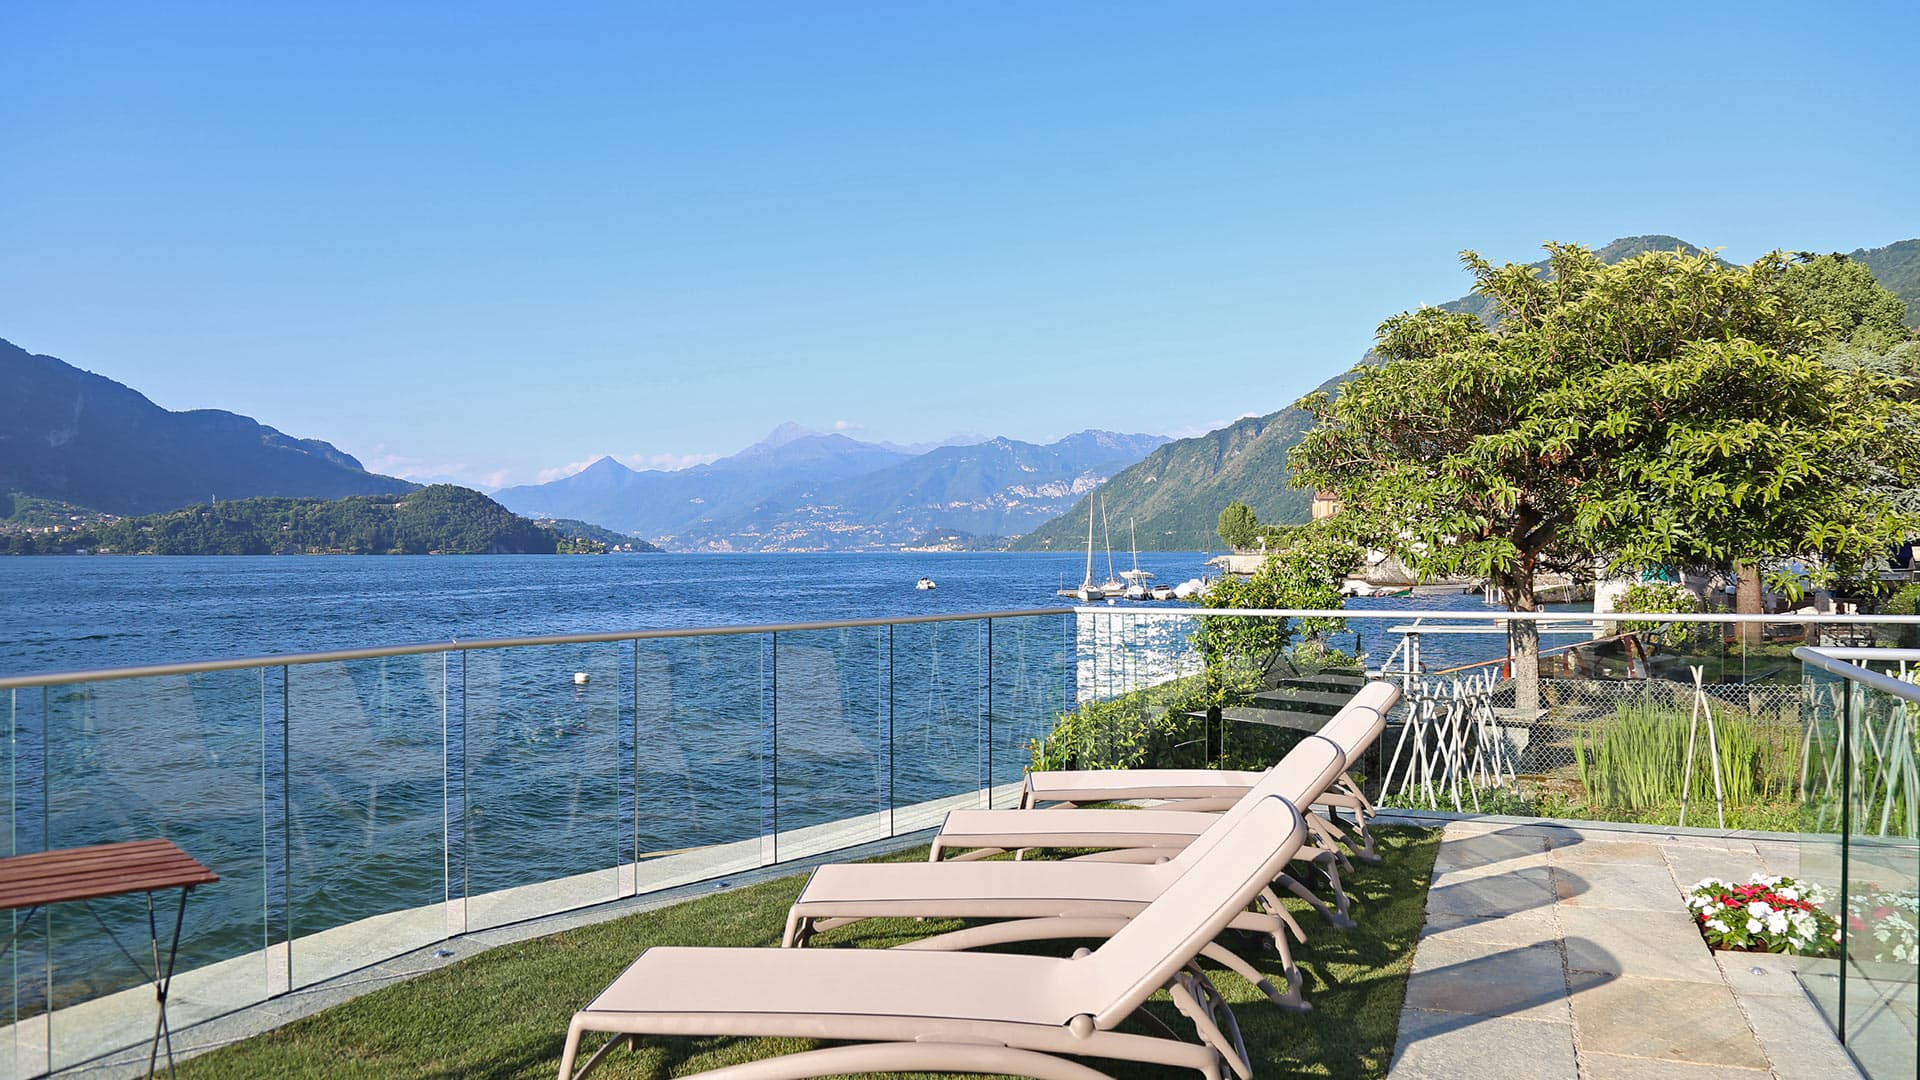 Villa Villa Laota, Rental in Lakes